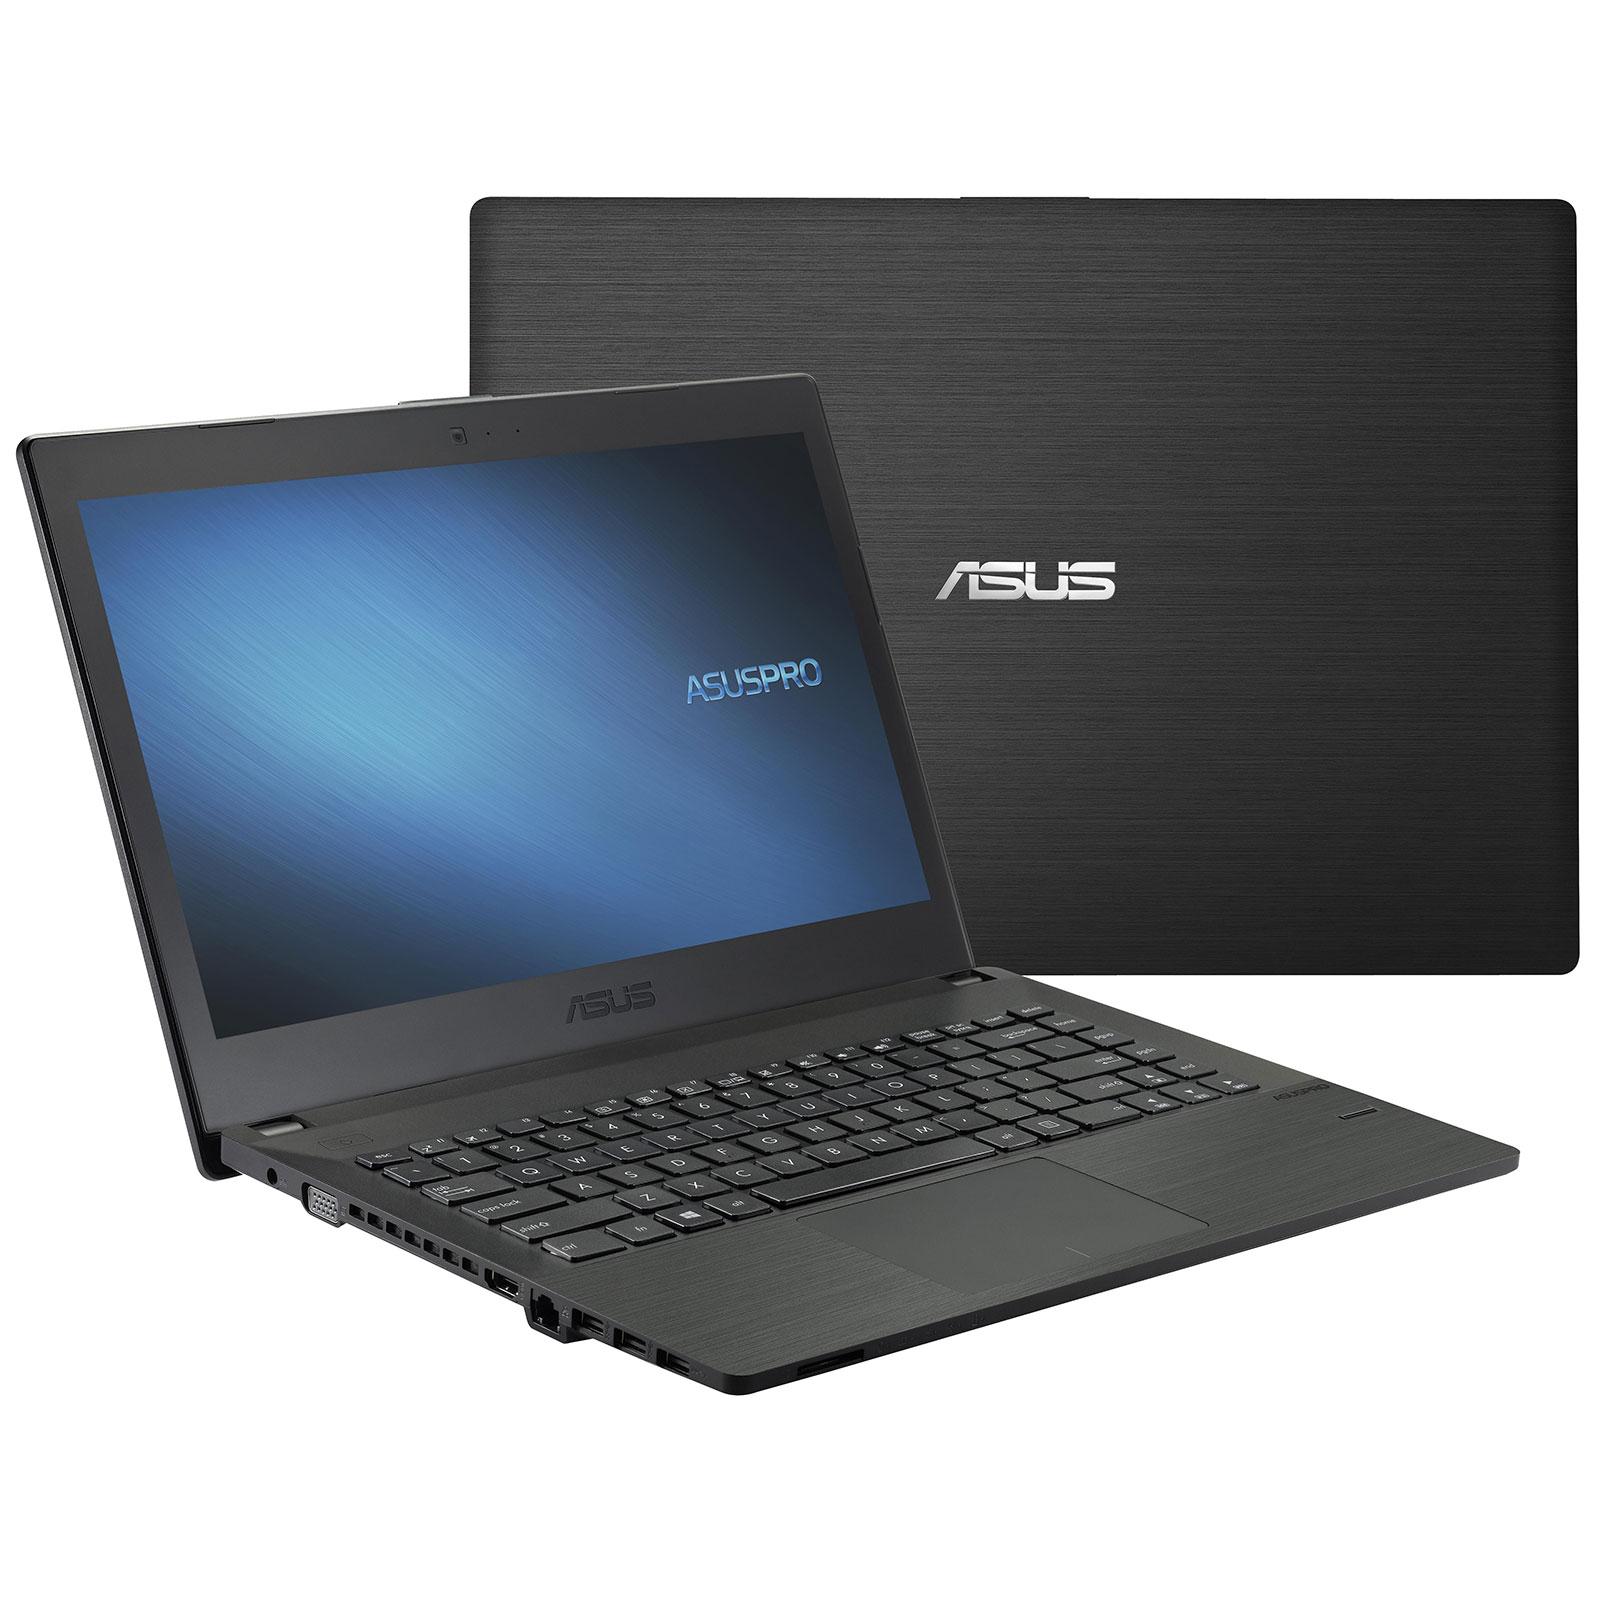 Asus 90NX0041-M02720 - PC portable Asus - Cybertek.fr - 0